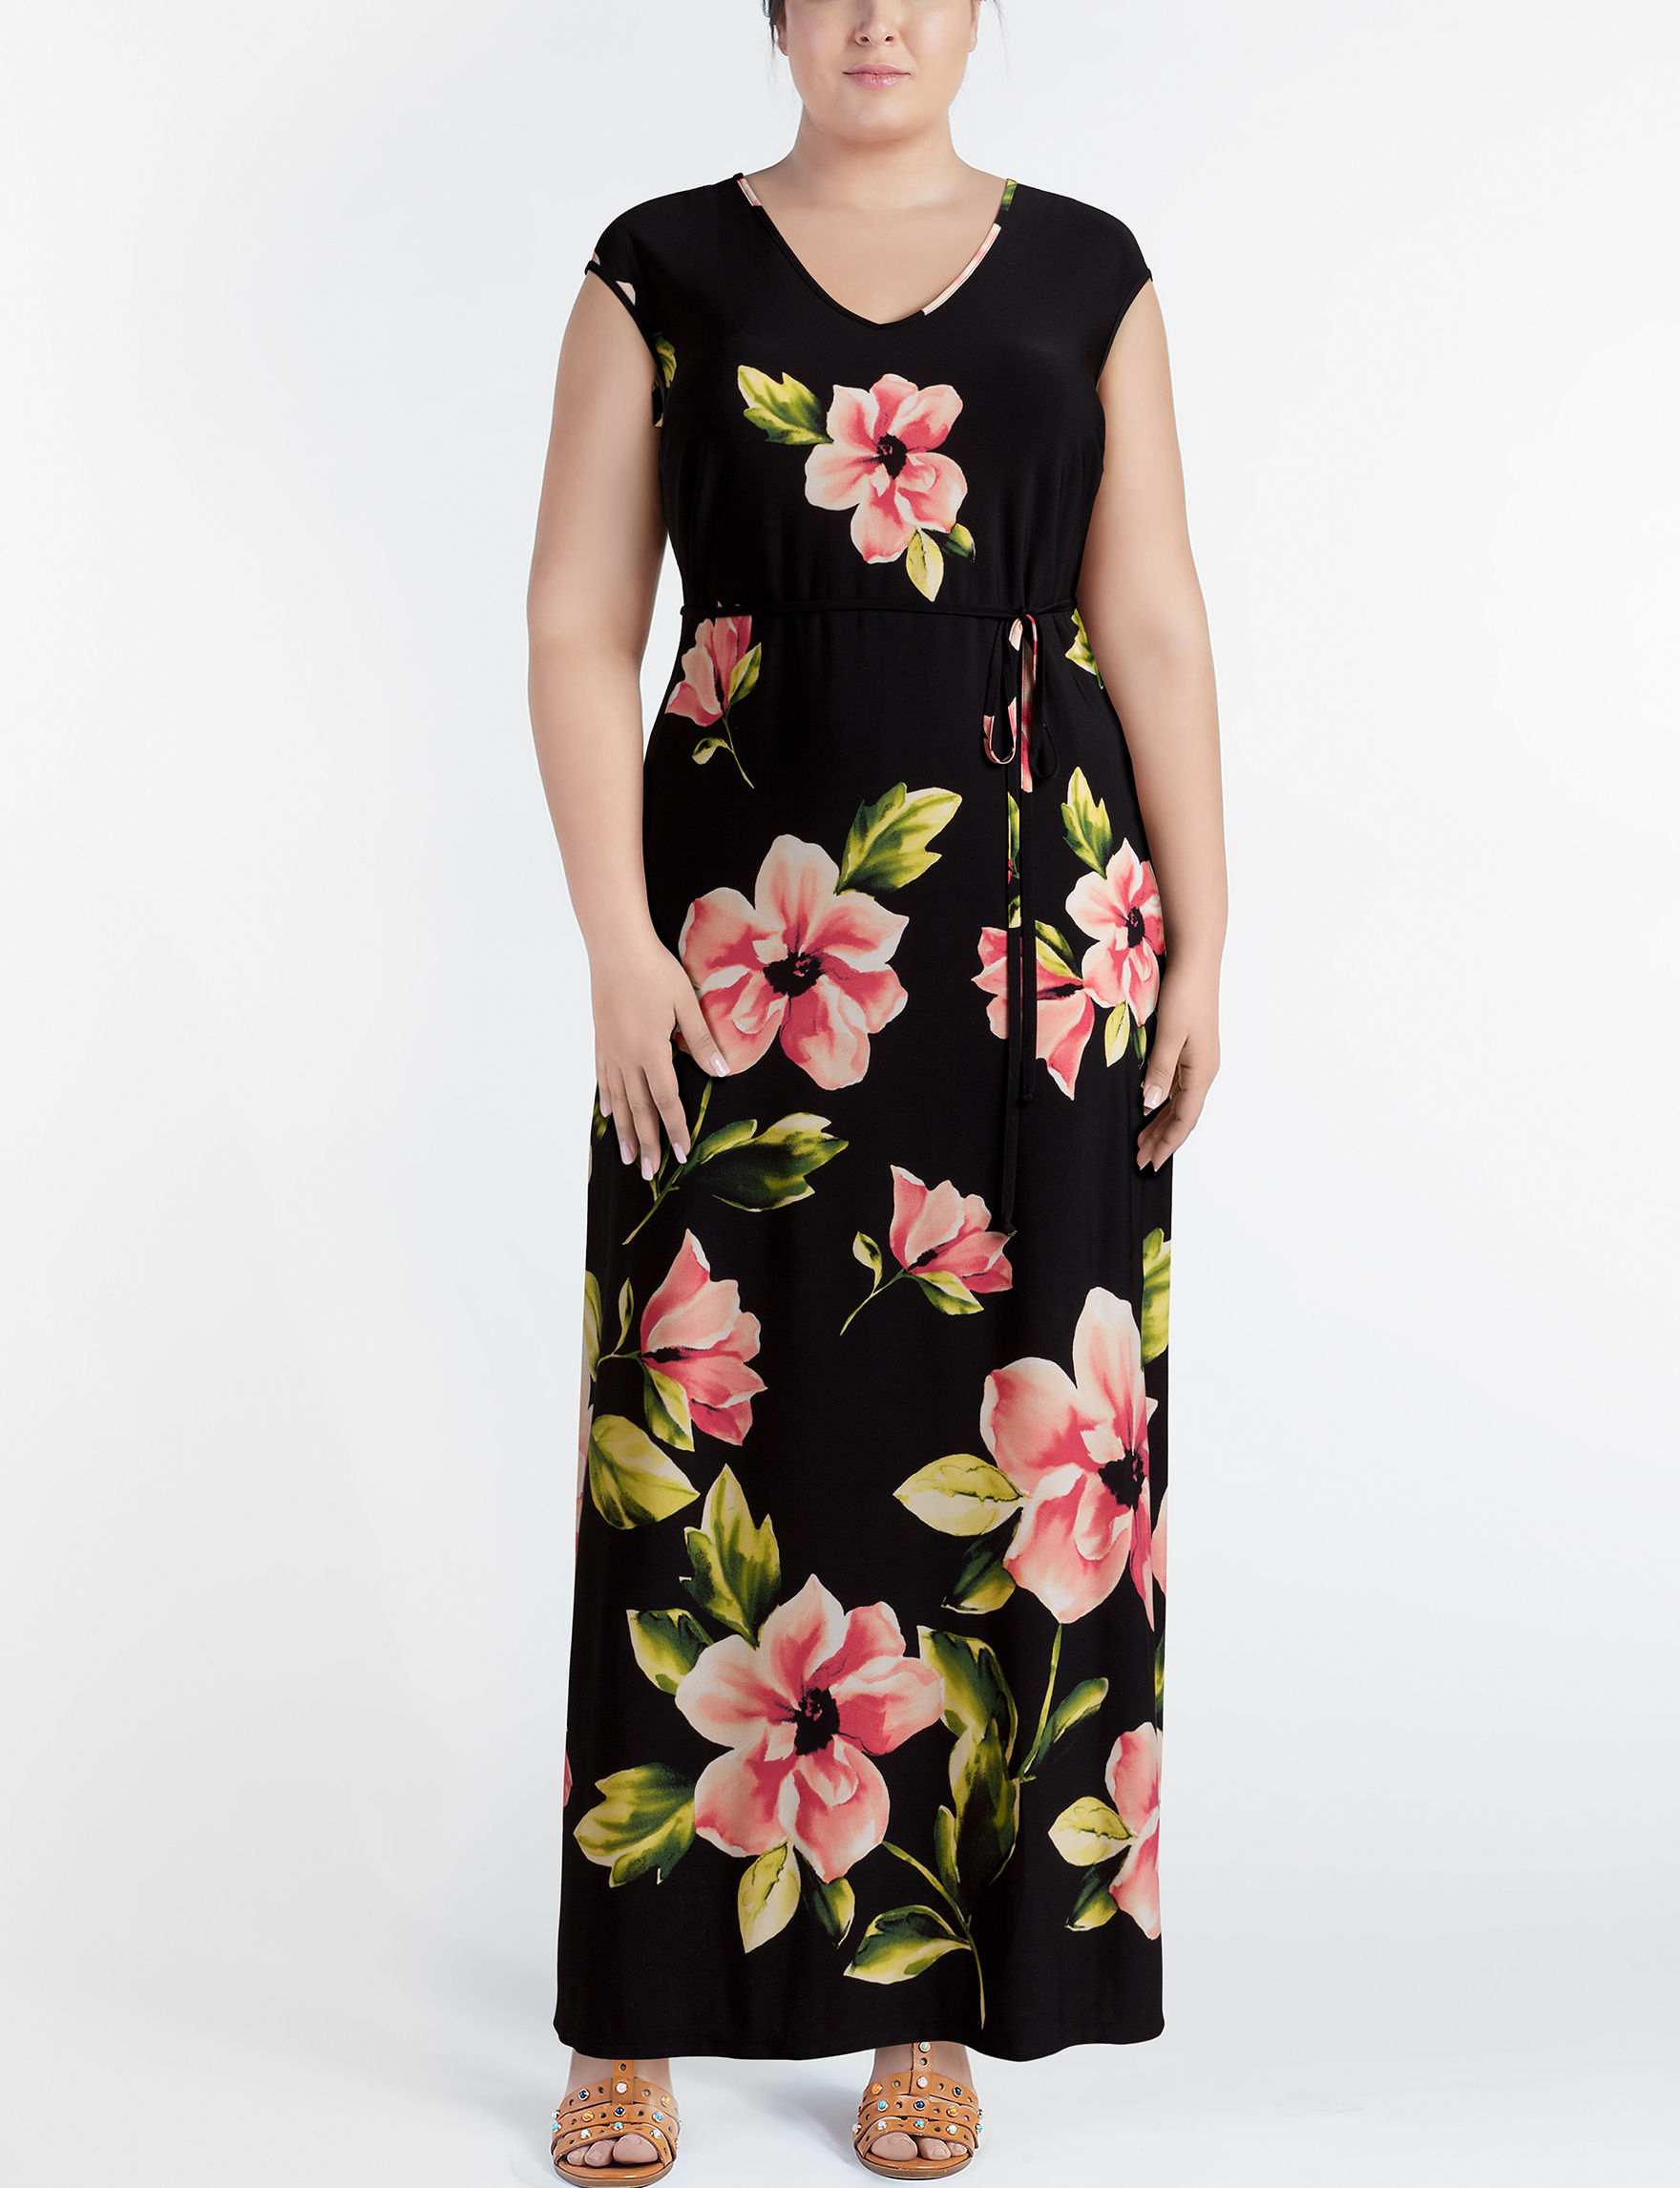 Chetta B Black Floral Everyday & Casual